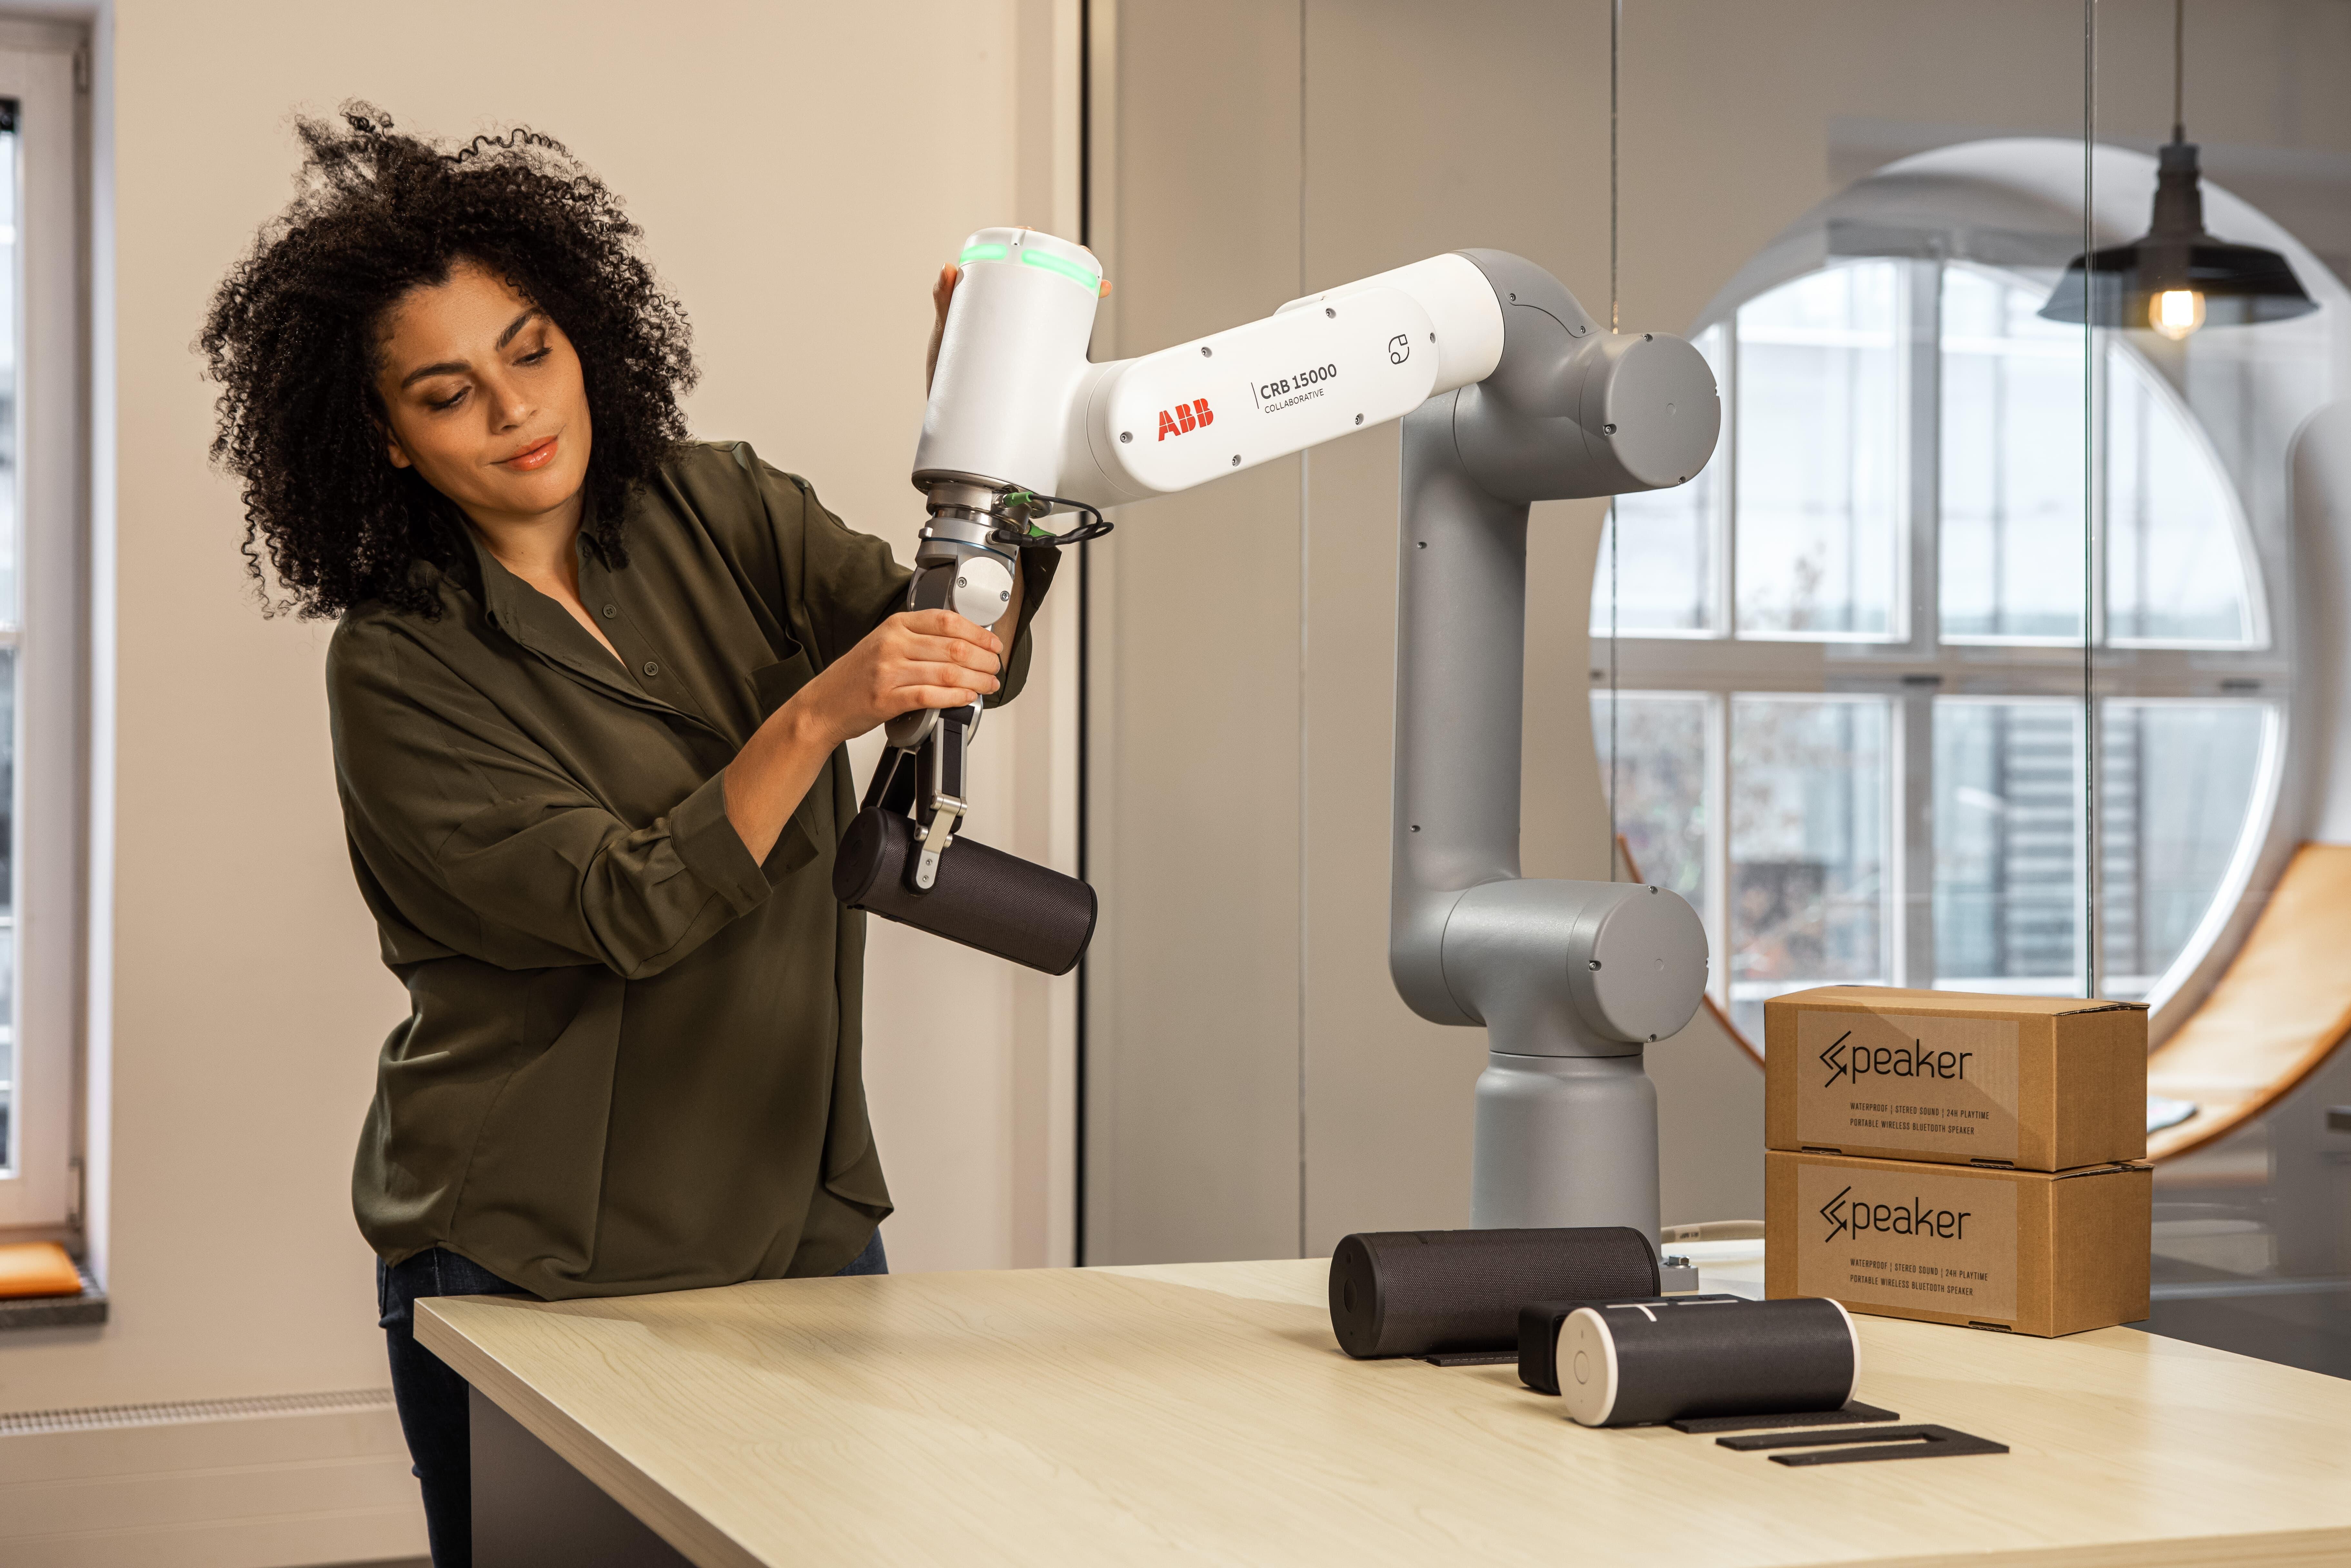 ABB、6軸協働ロボット新製品リリースのお知らせ